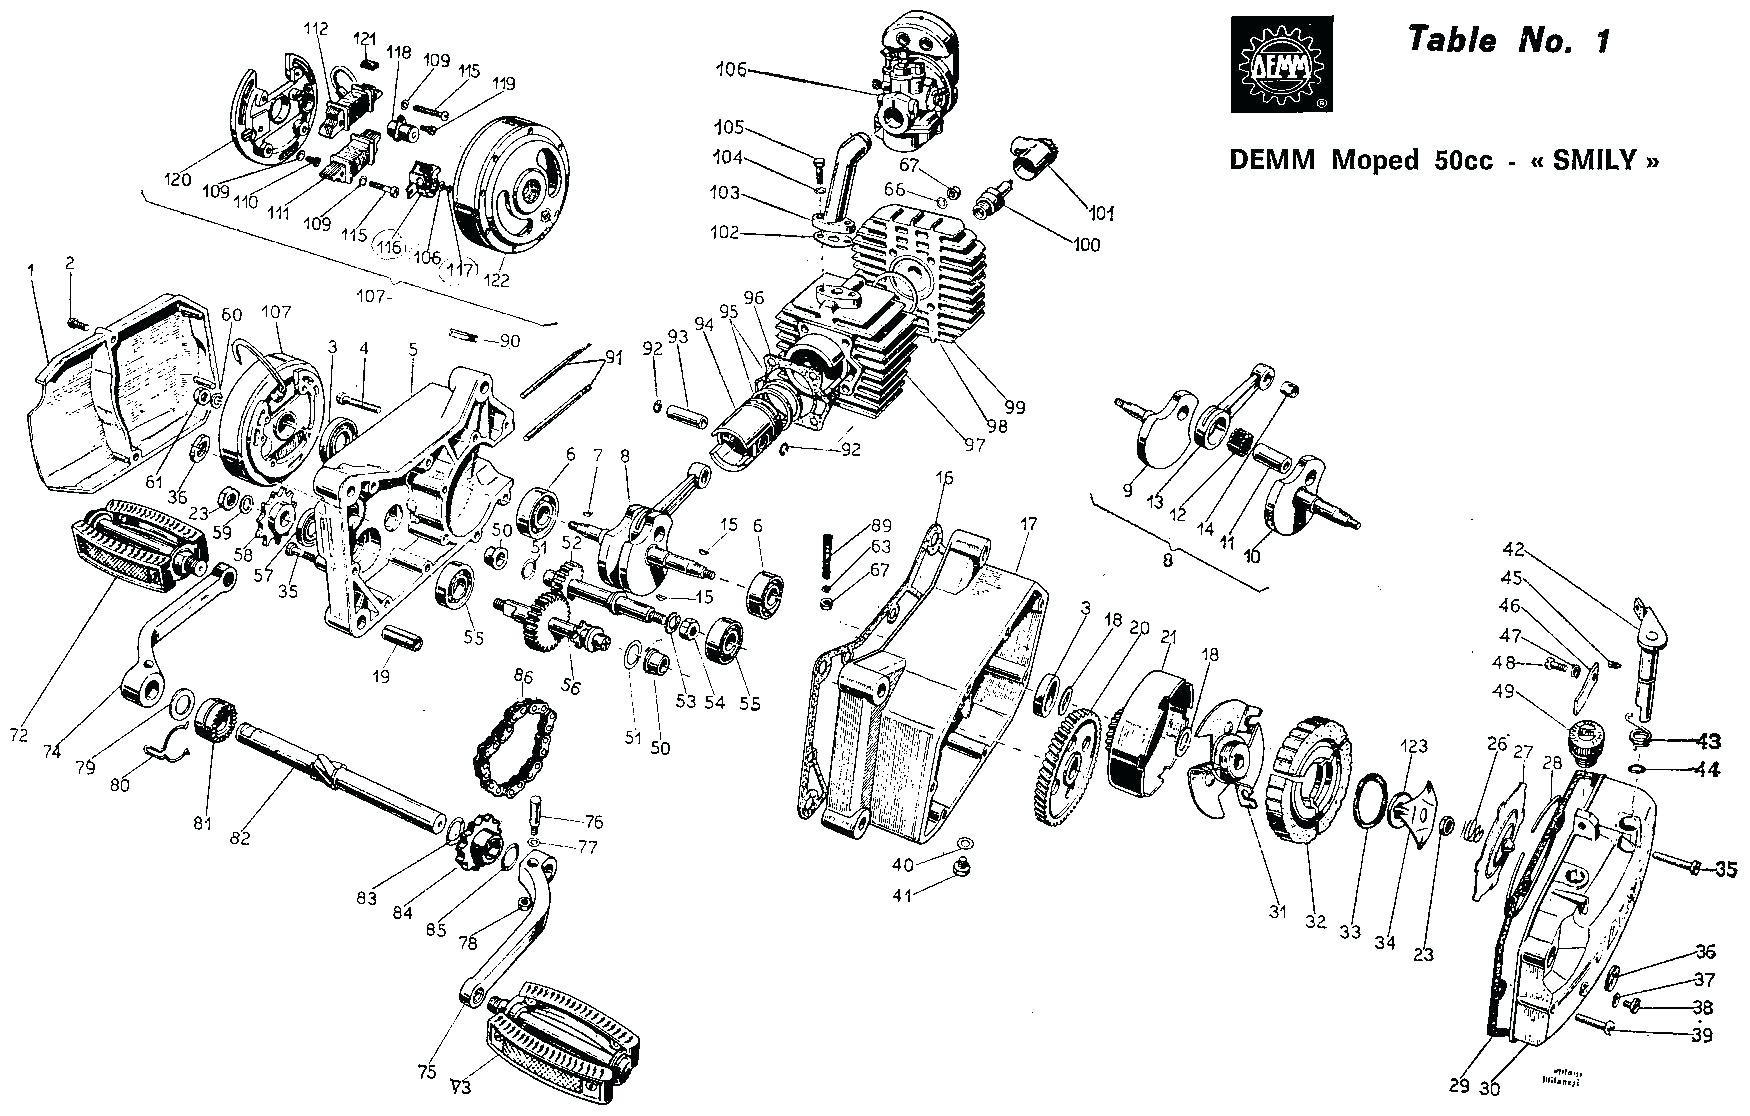 a35 wiring diagram wiring library Honda XL Scrambler tomos a55 engine diagram tomos a35 engine diagram motor wiring